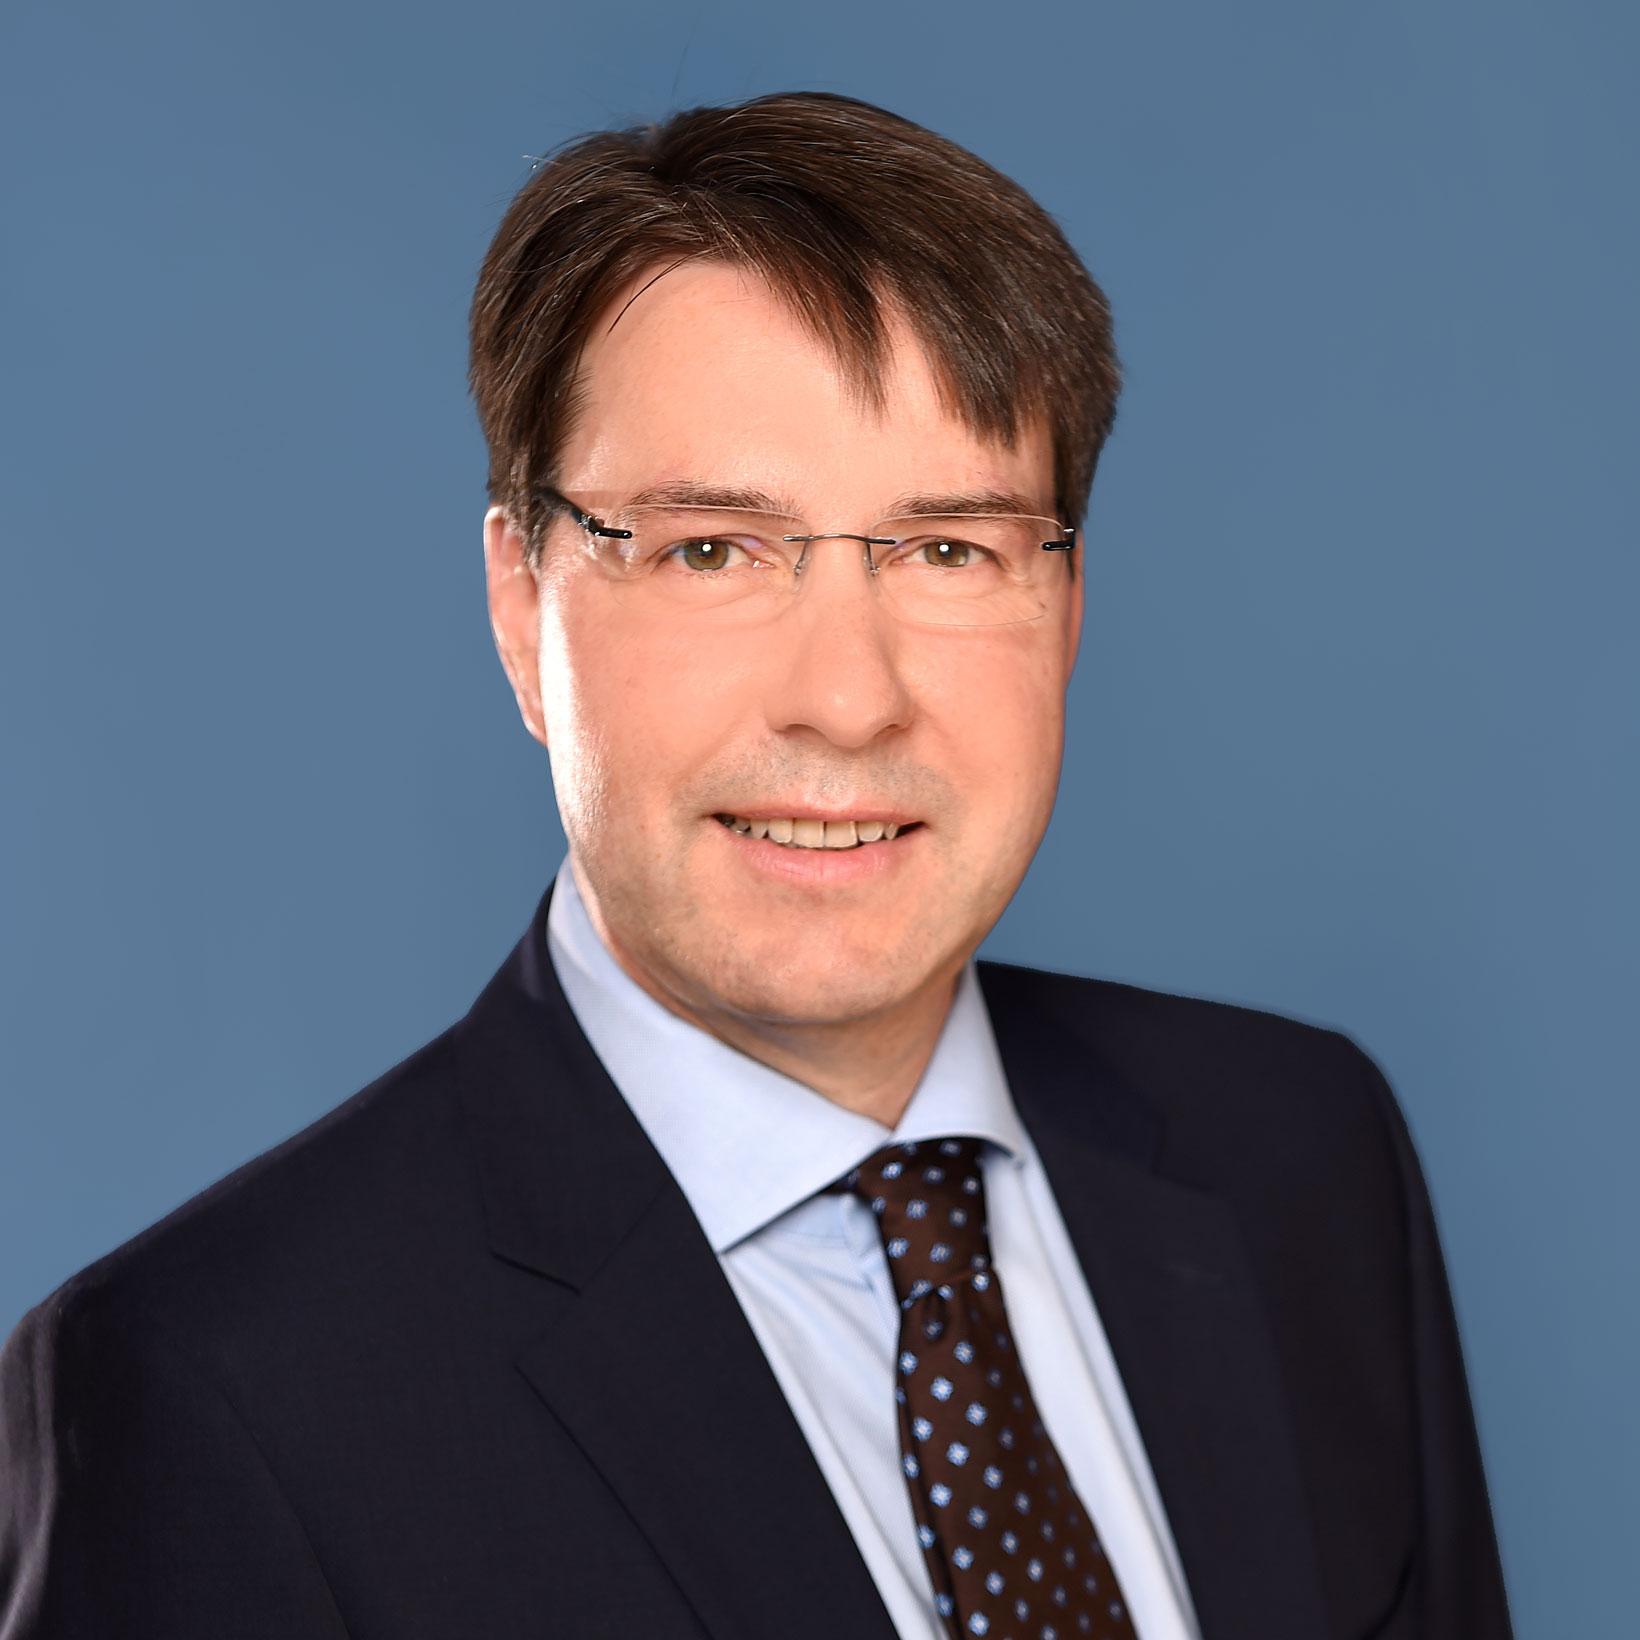 B79 Dr Andreas Trotzer 7503WEB